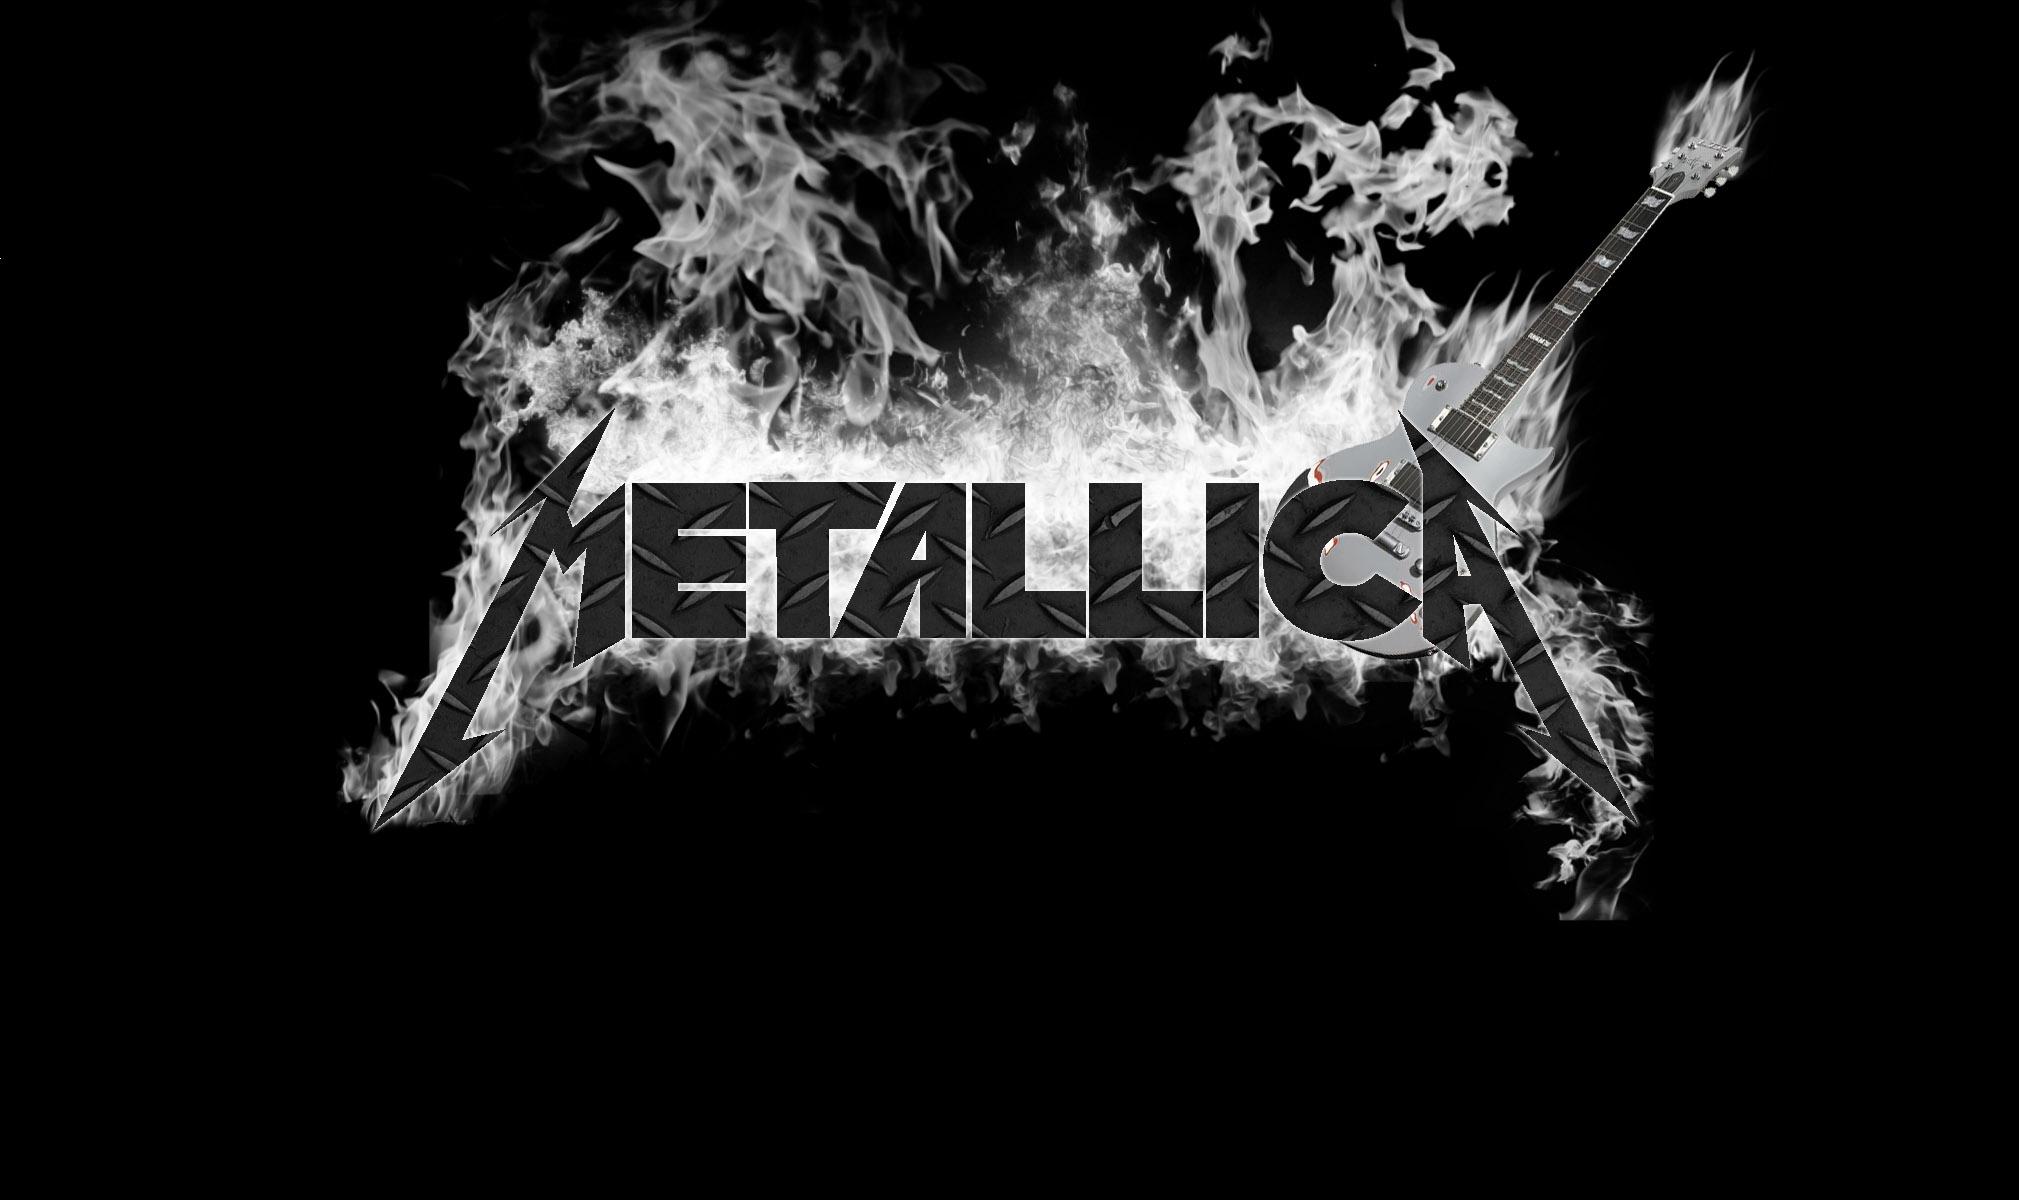 Pictures Of Metallica 92